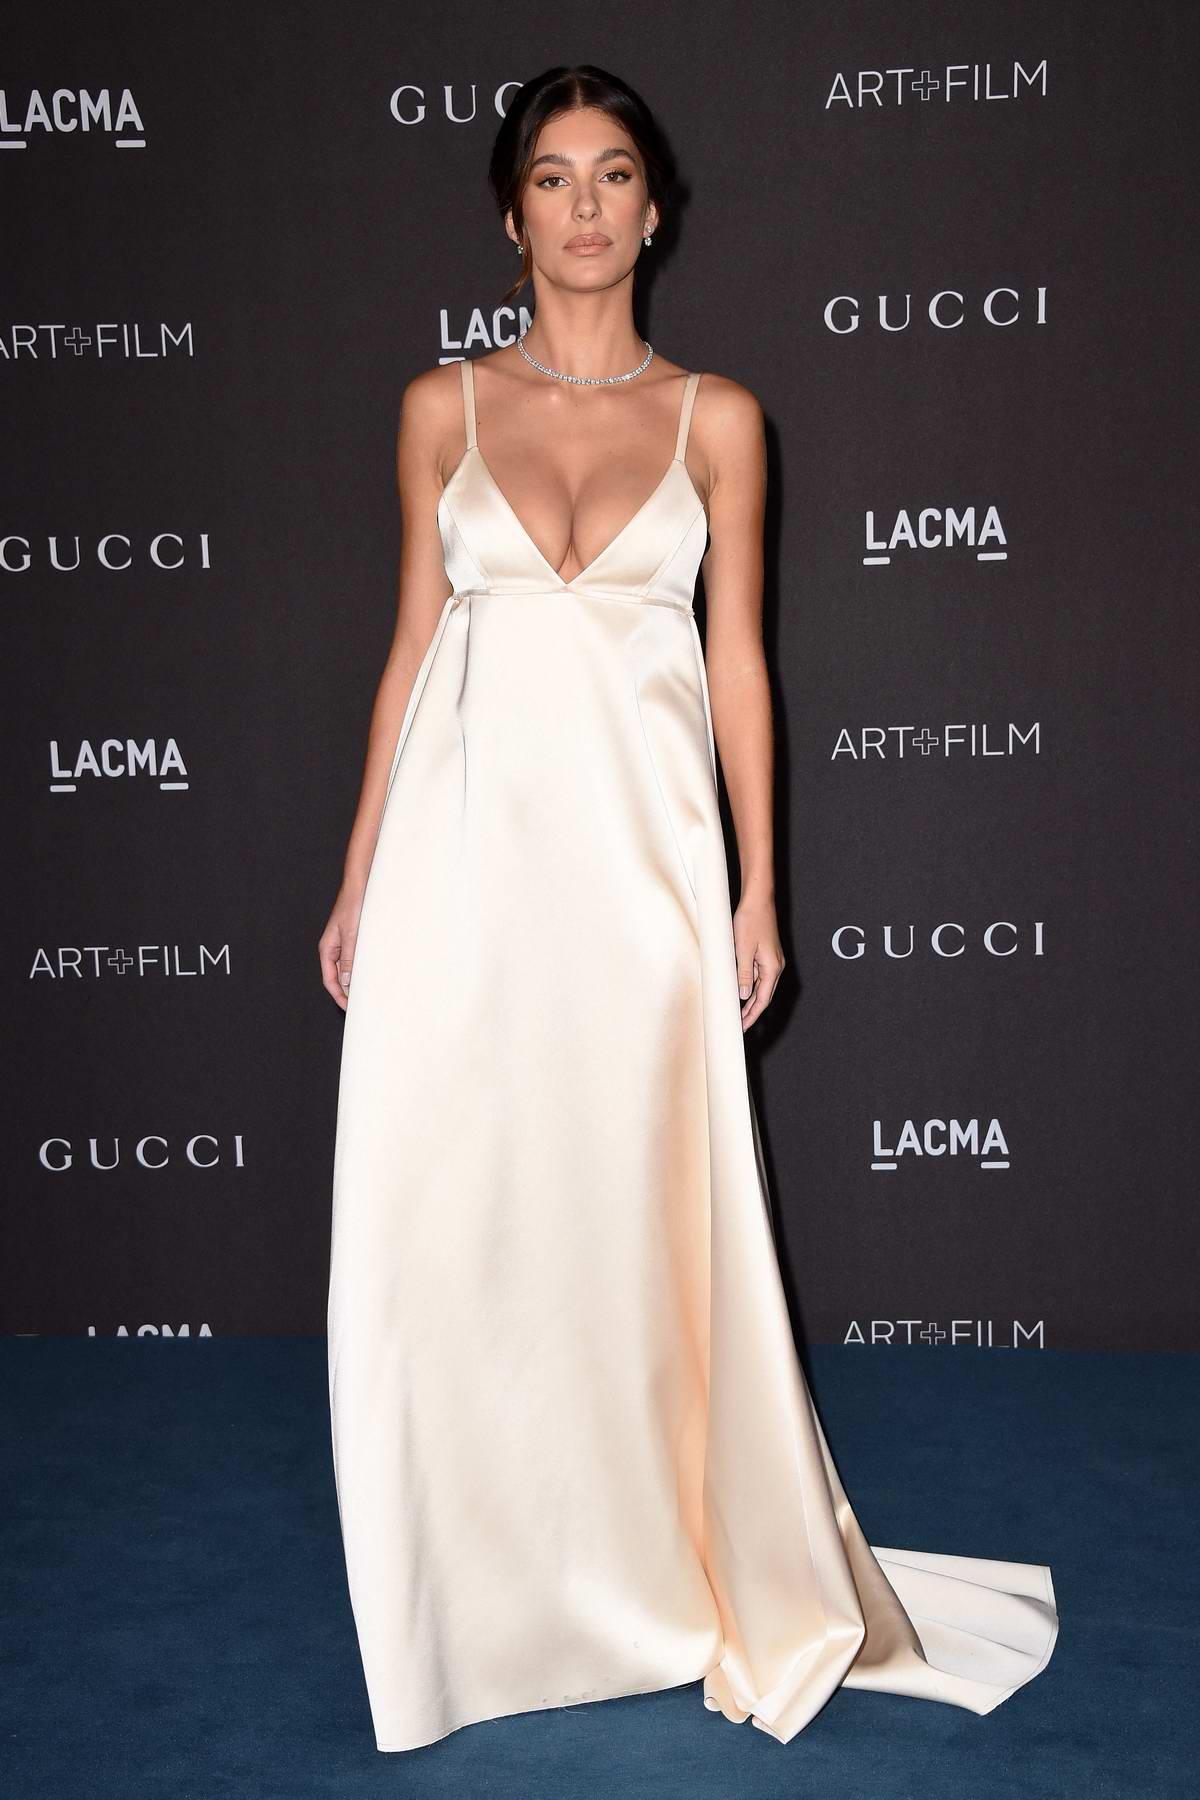 Camila Morrone attends the 2019 LACMA 2019 Art + Film Gala in Los Angeles